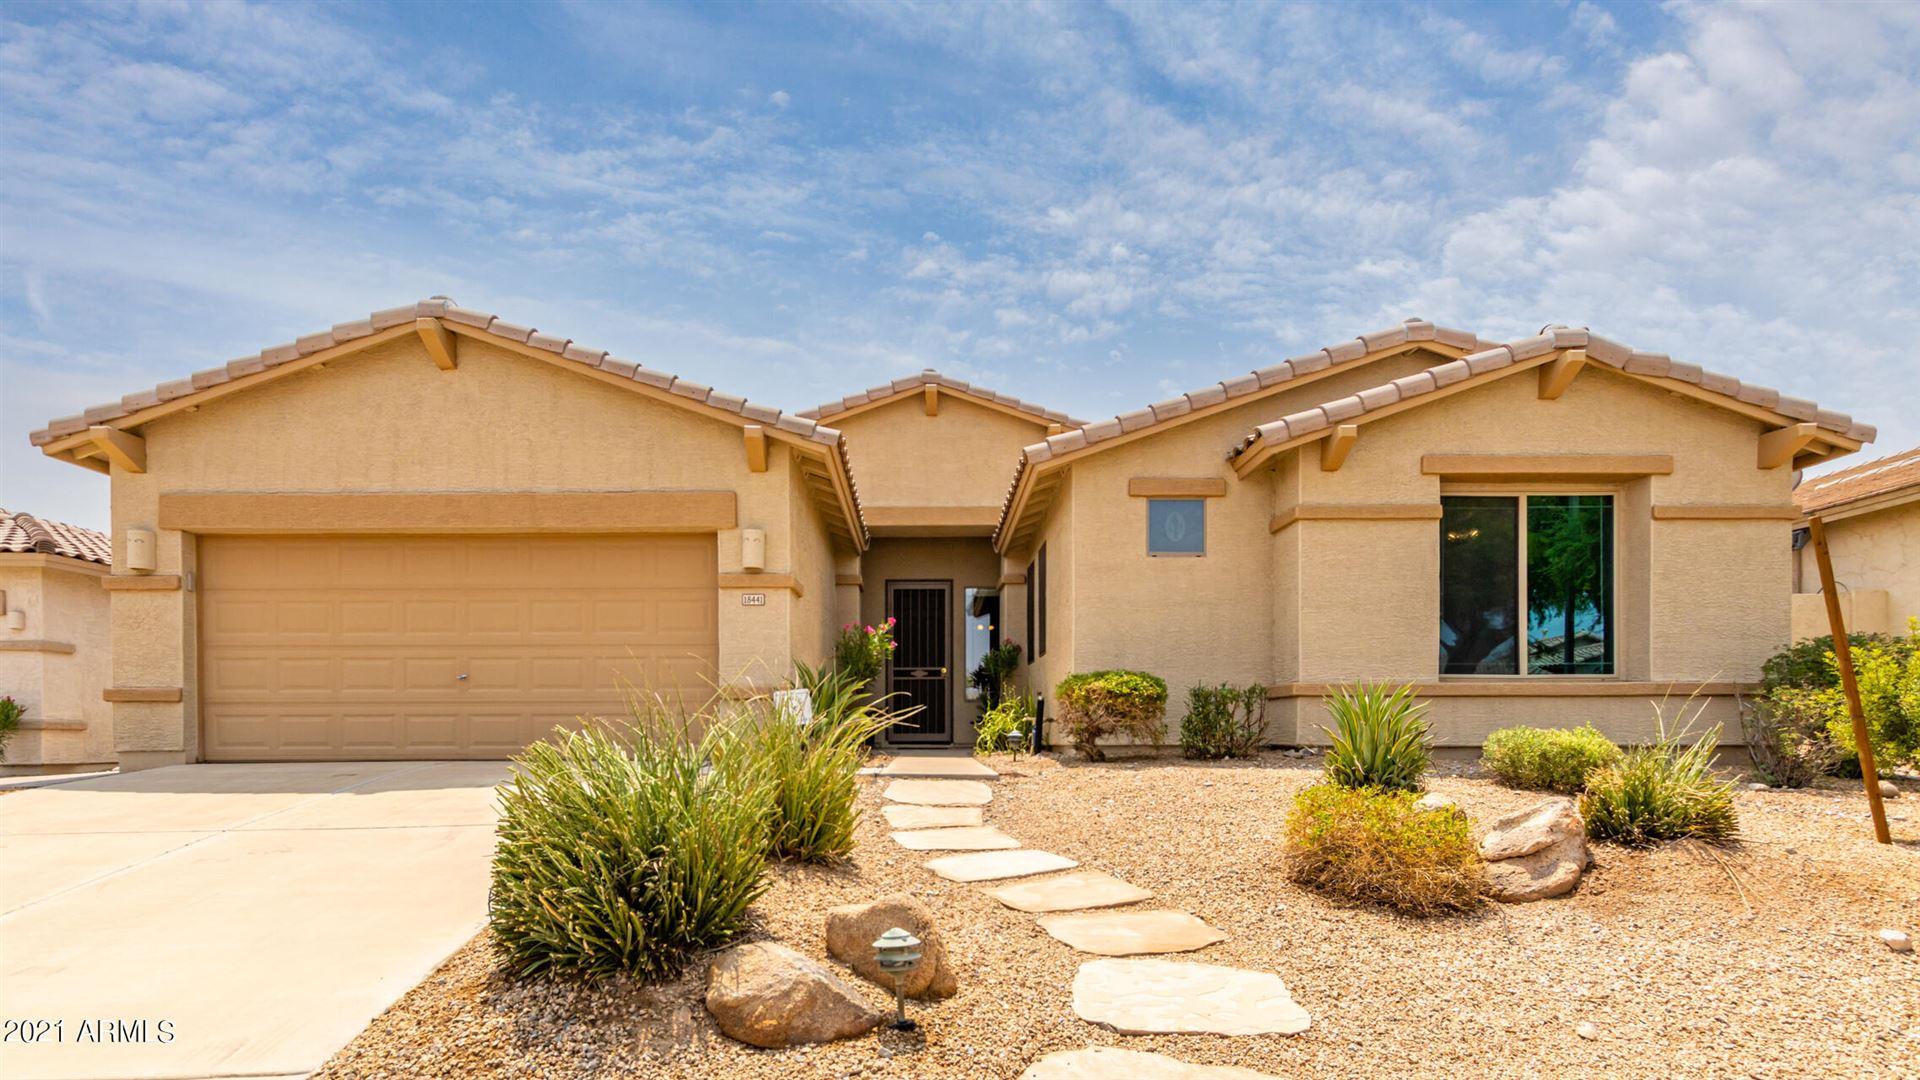 Photo of 18441 W CAPISTRANO Avenue, Goodyear, AZ 85338 (MLS # 6295609)